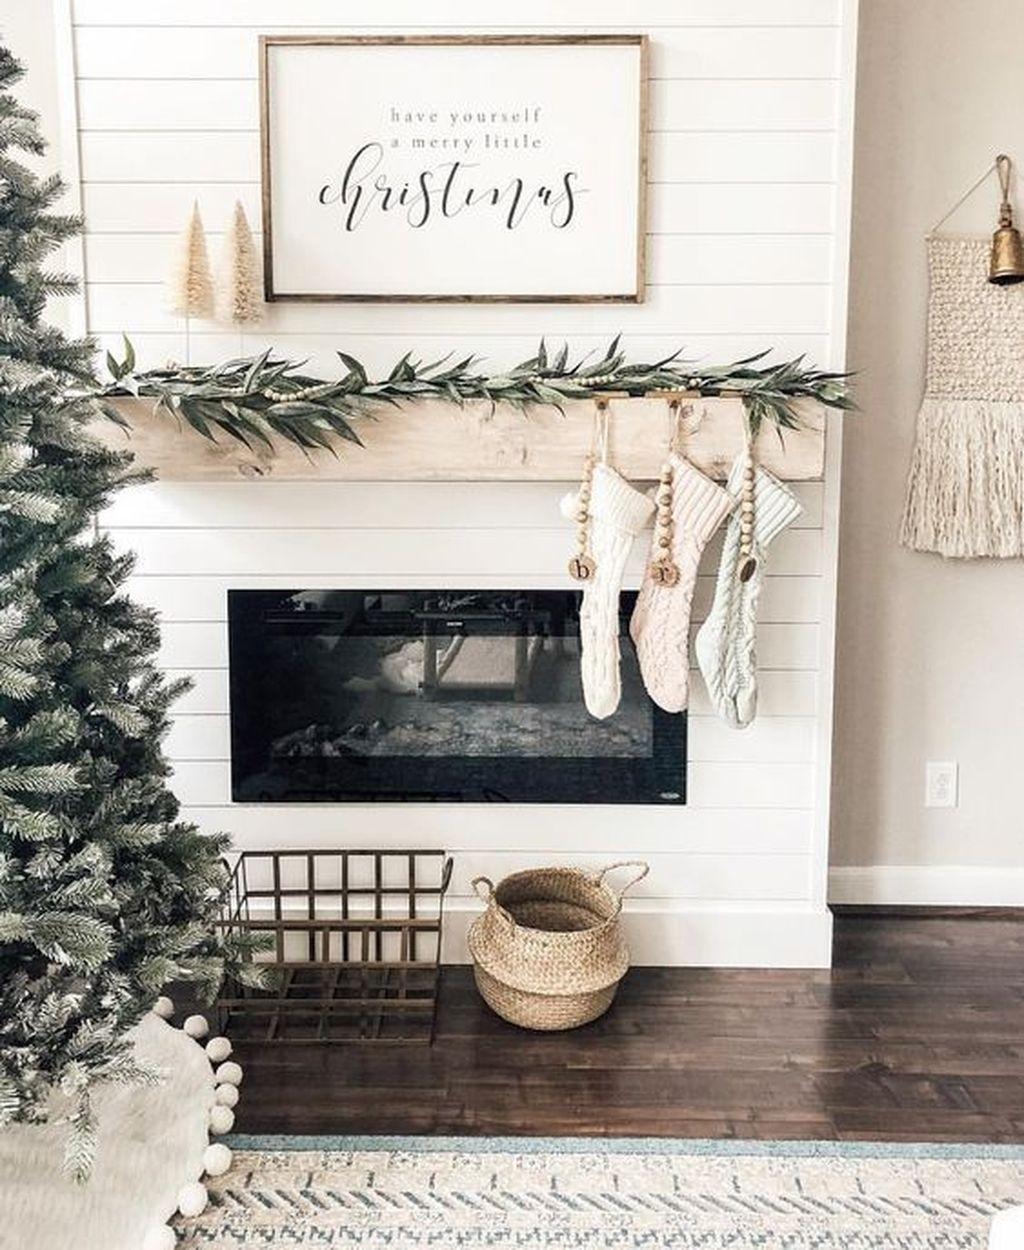 38 Spectacular Fireplace Decor Ideas For Nuances Romantic #christmasdecorations